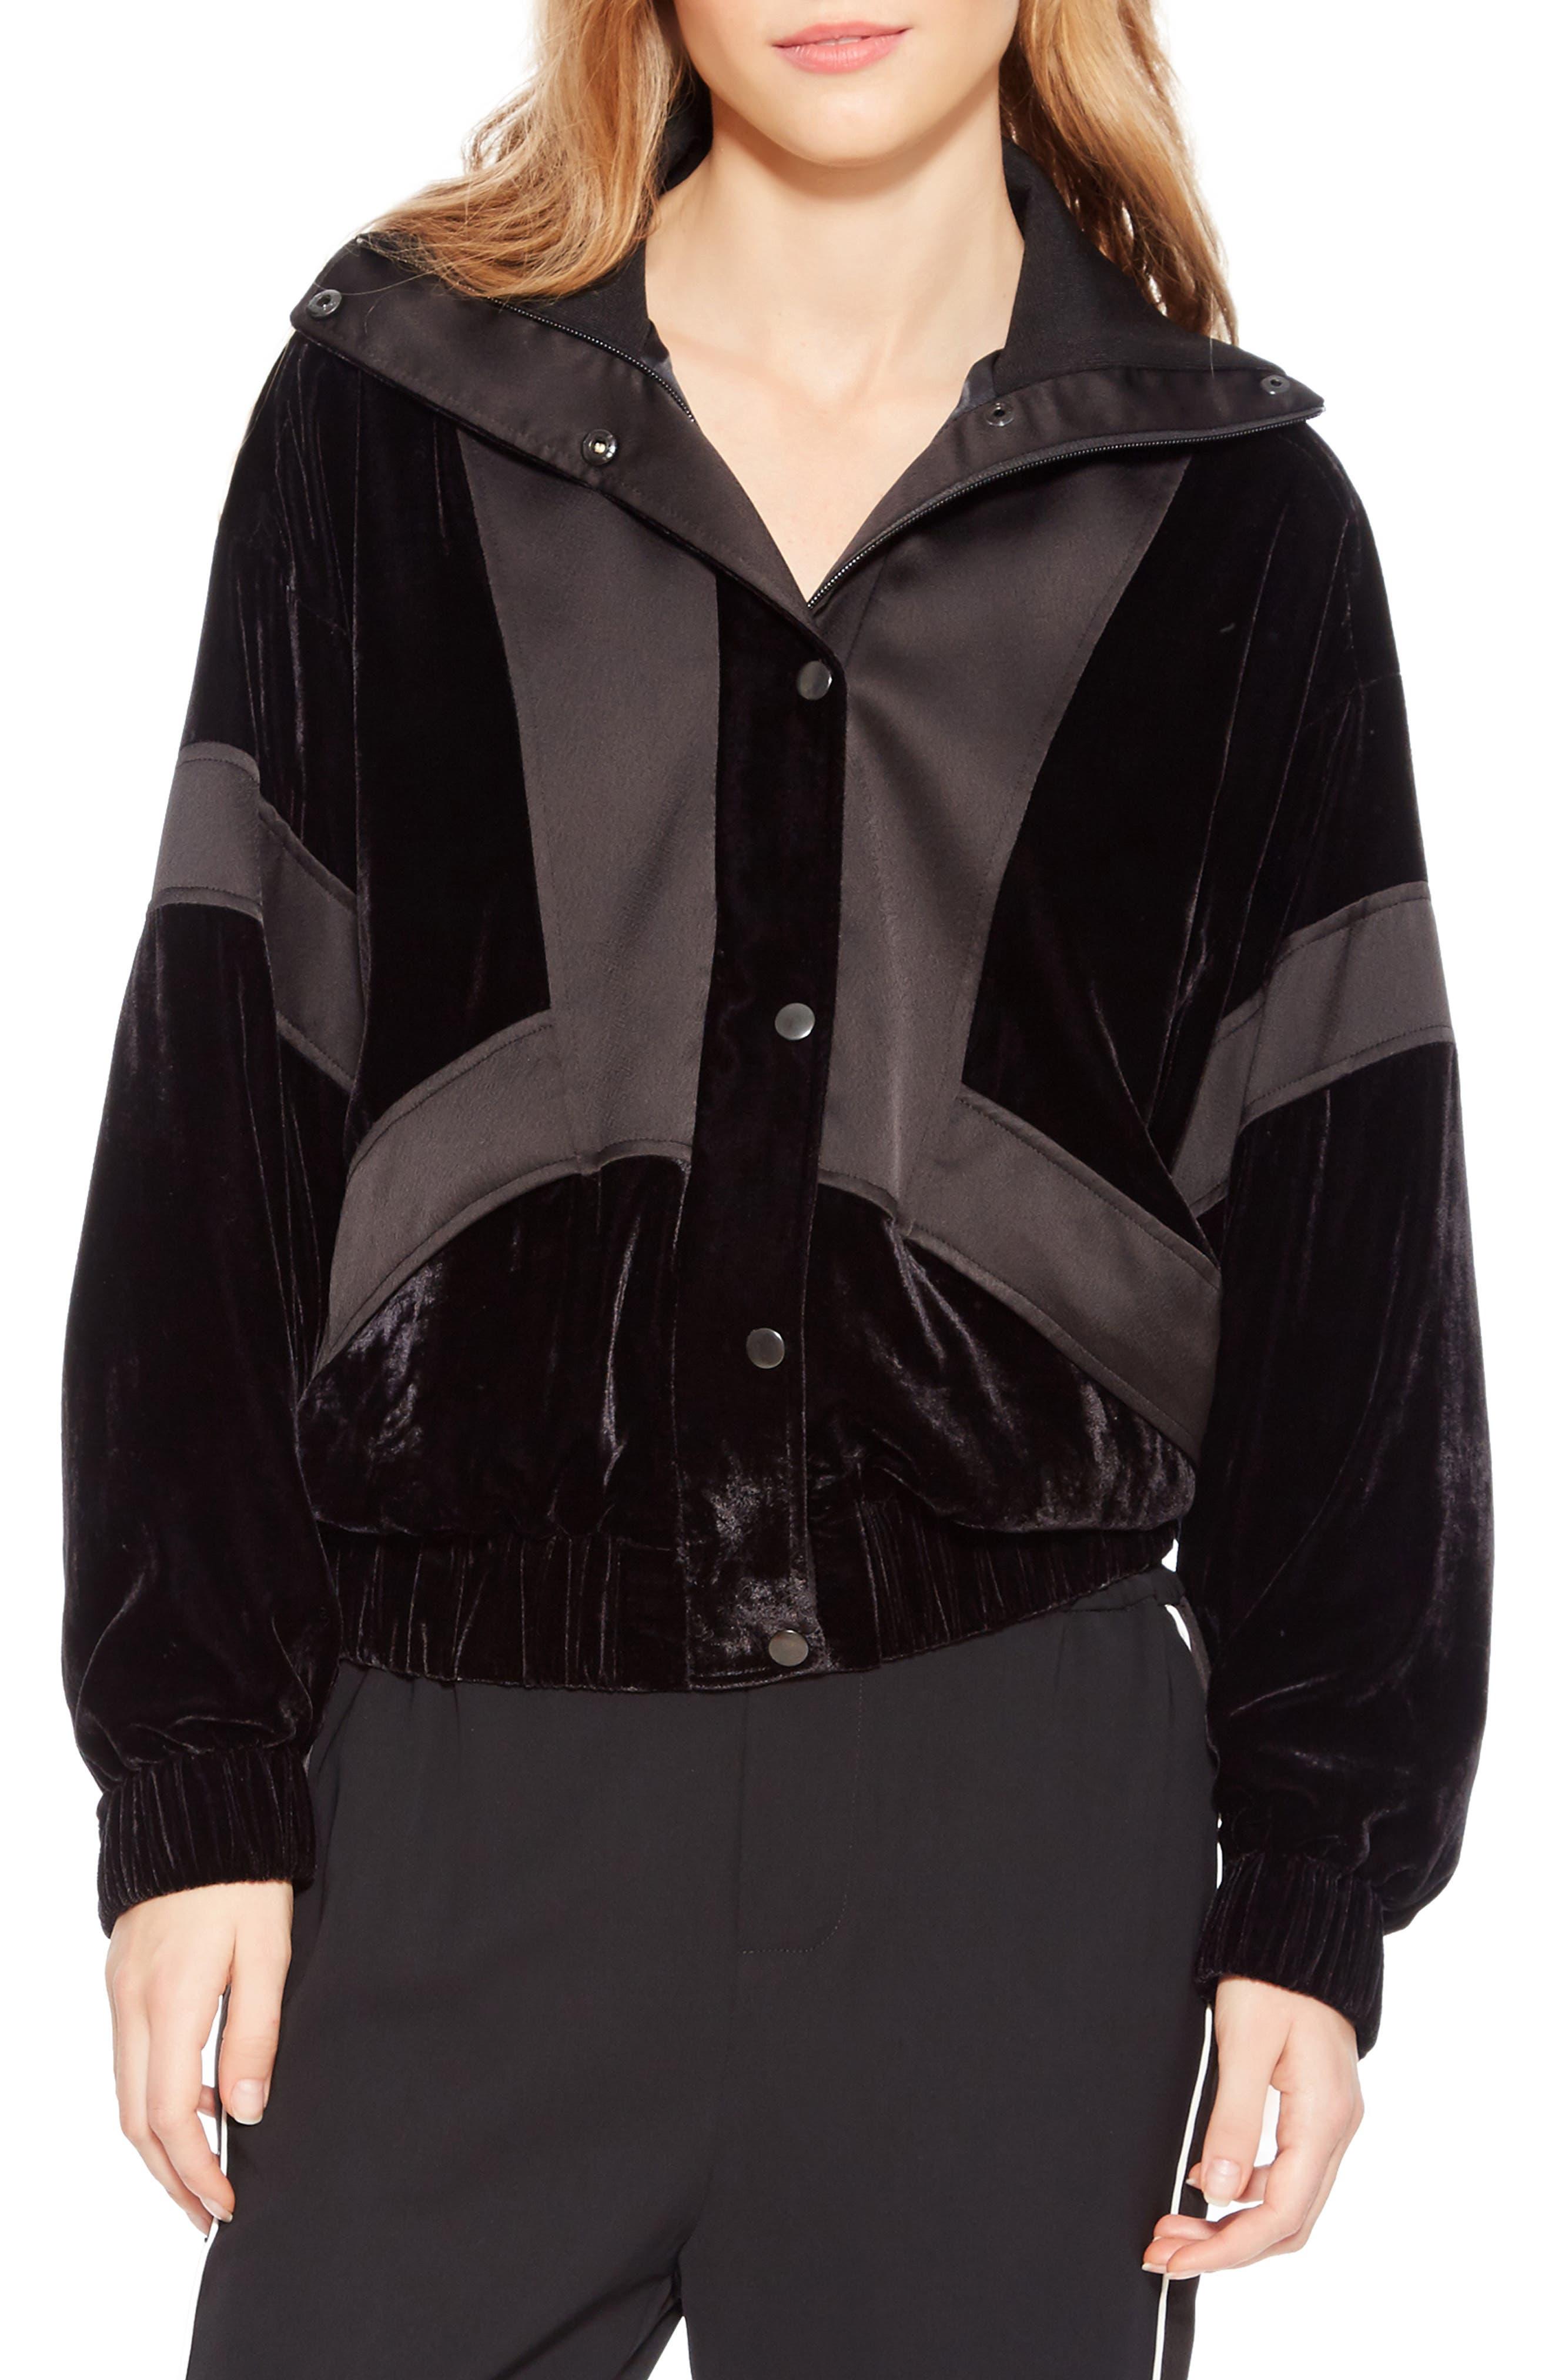 Hollis Jacket,                             Main thumbnail 1, color,                             BLACK